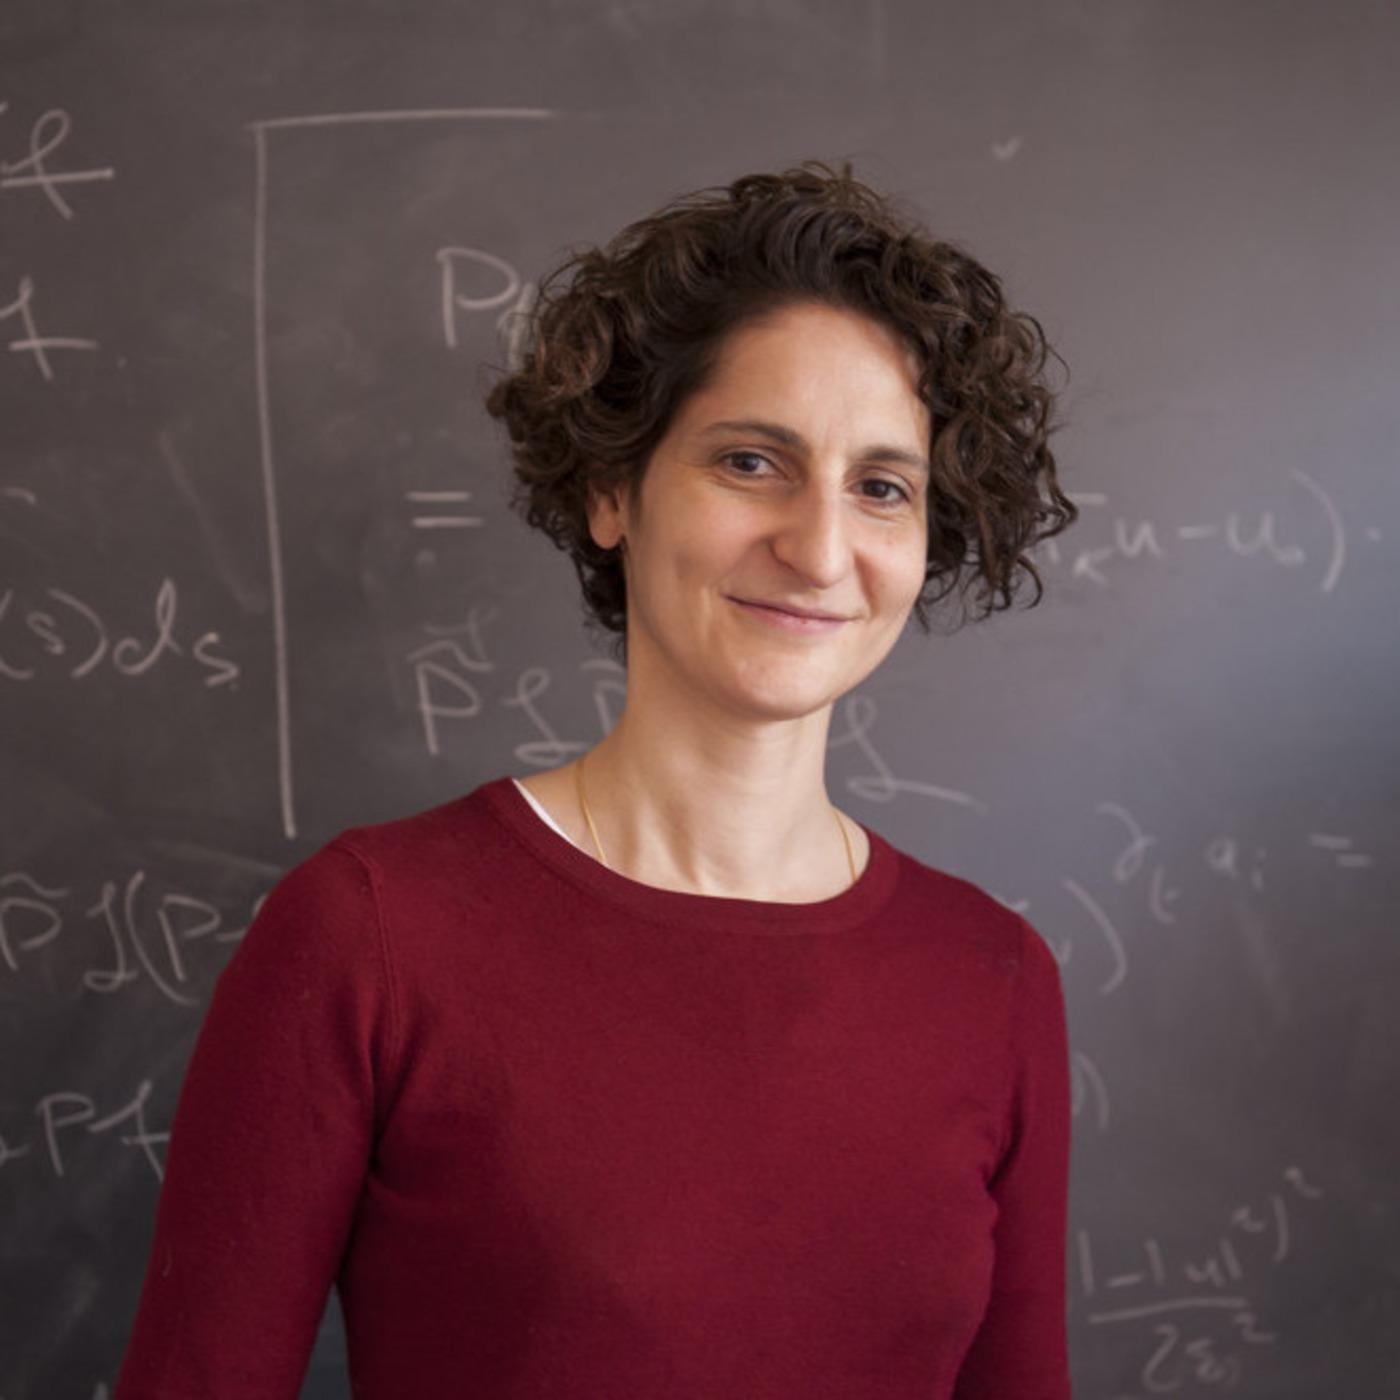 Sylvia Serfaty, la boss des maths